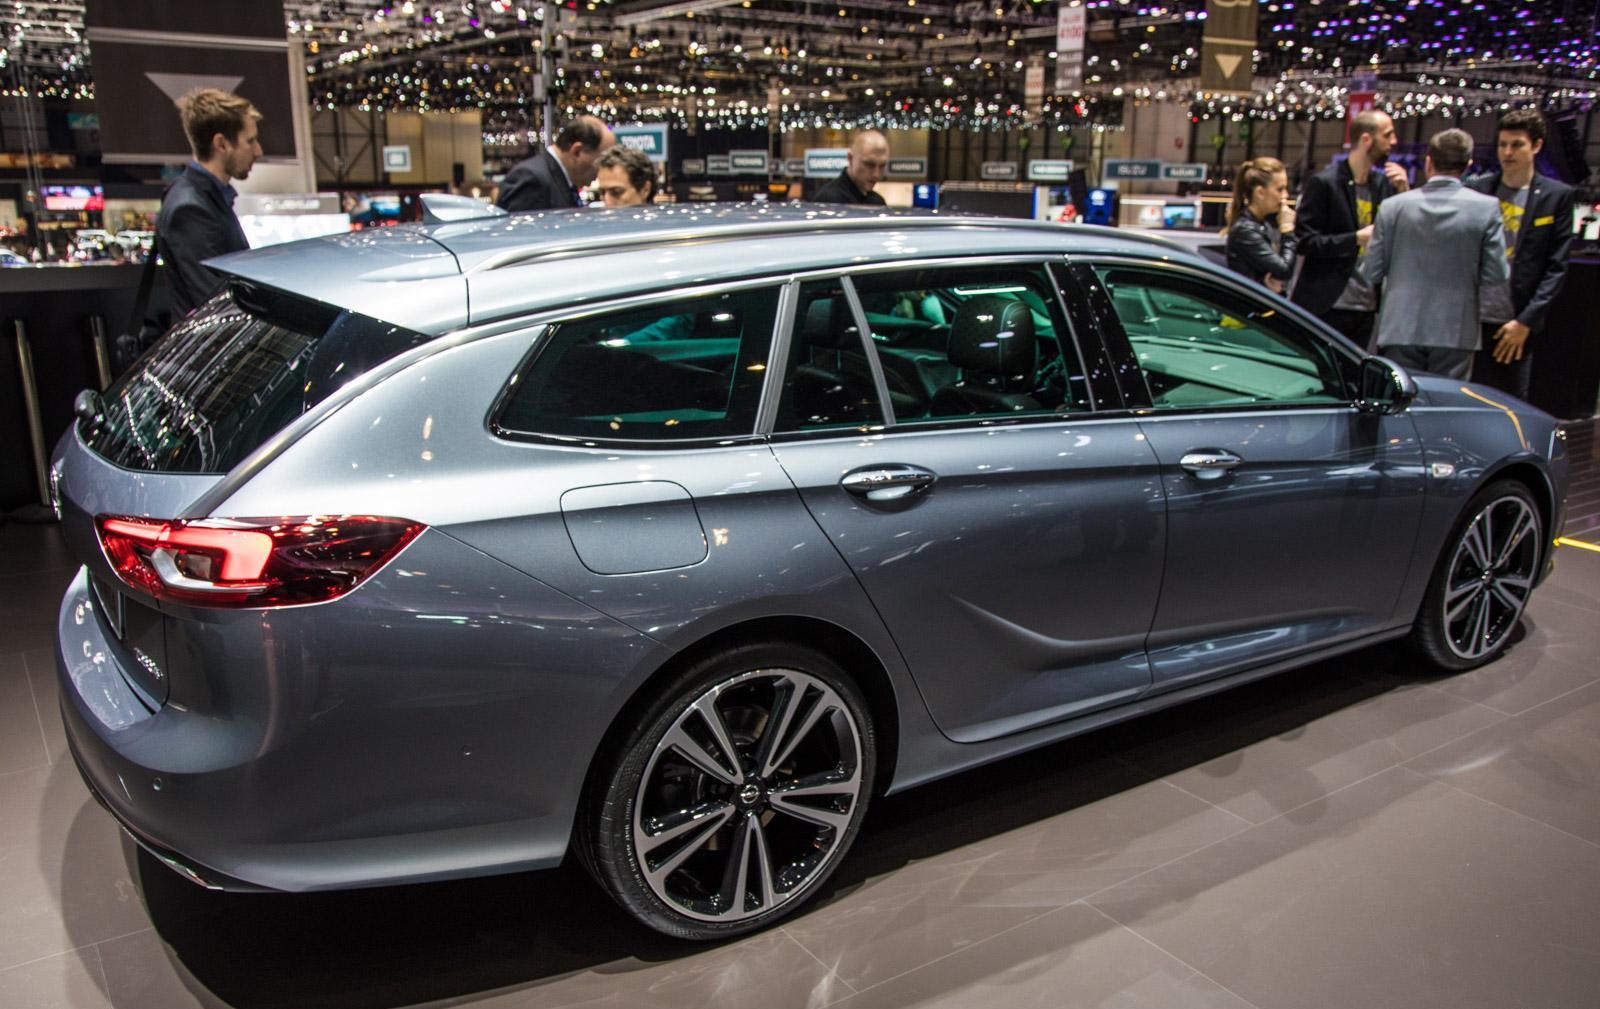 Opel-insignia-006